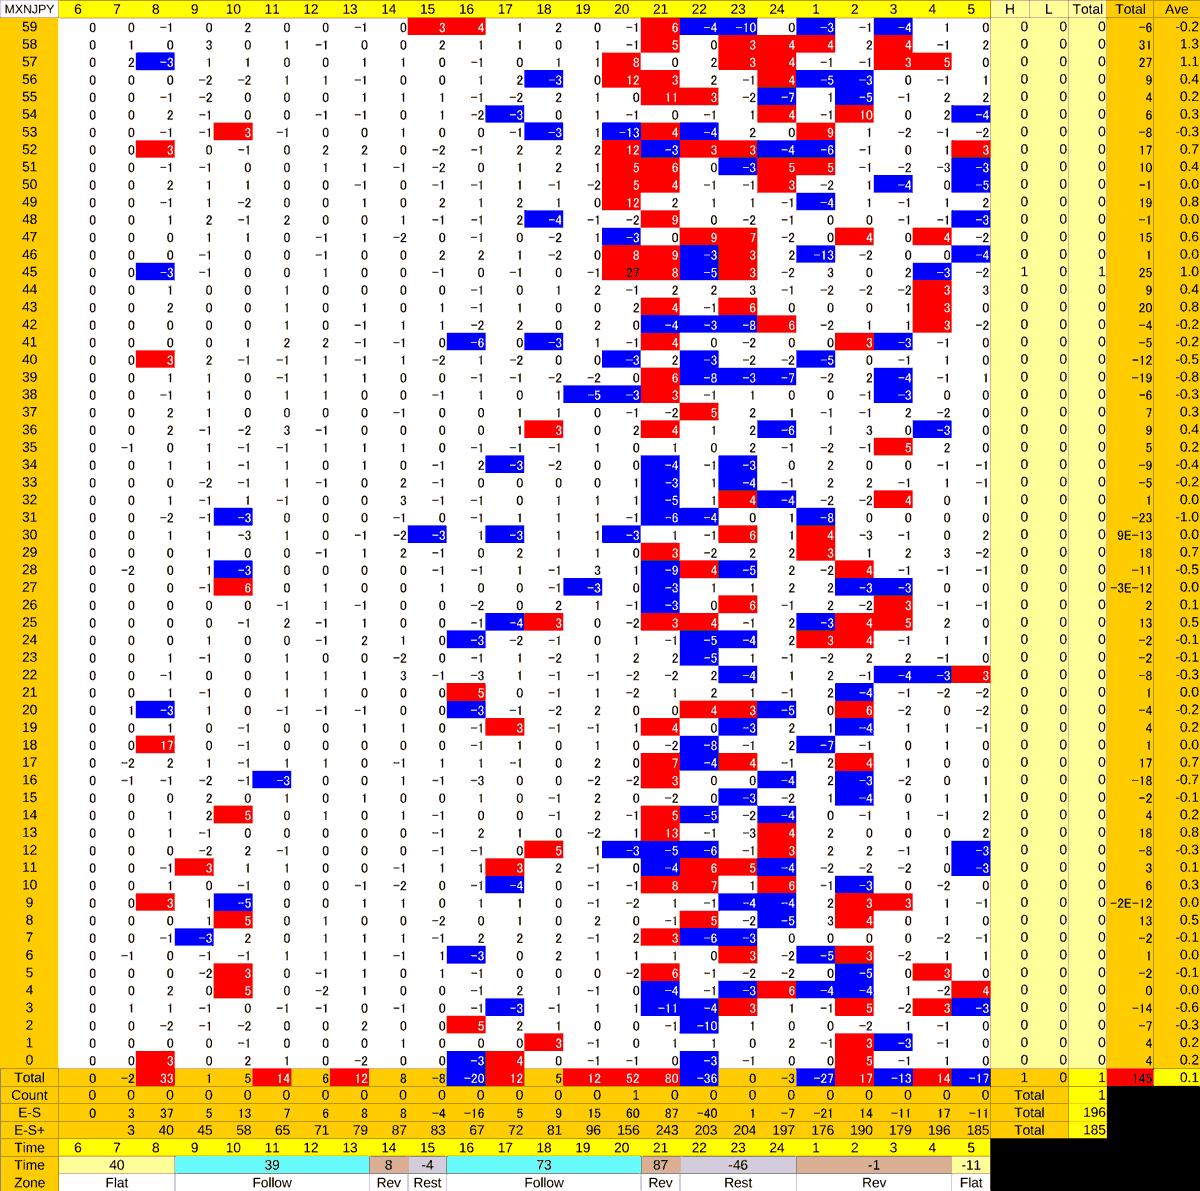 20201109_HS(3)MXNJPY